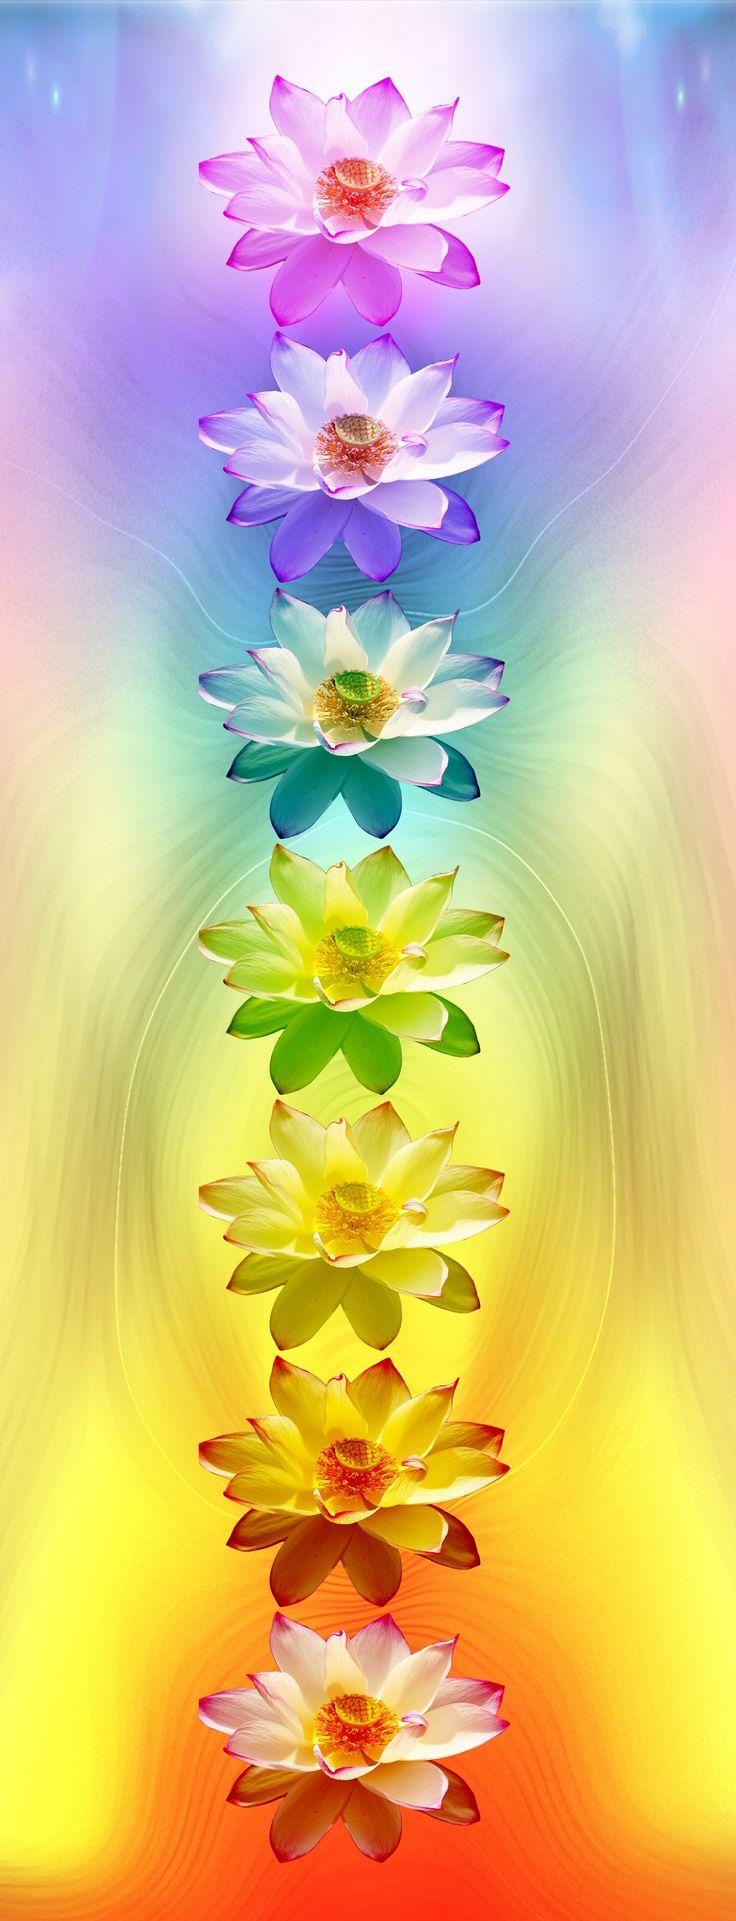 chakra-flowers-e1338904250765.jpg (1297×3386)